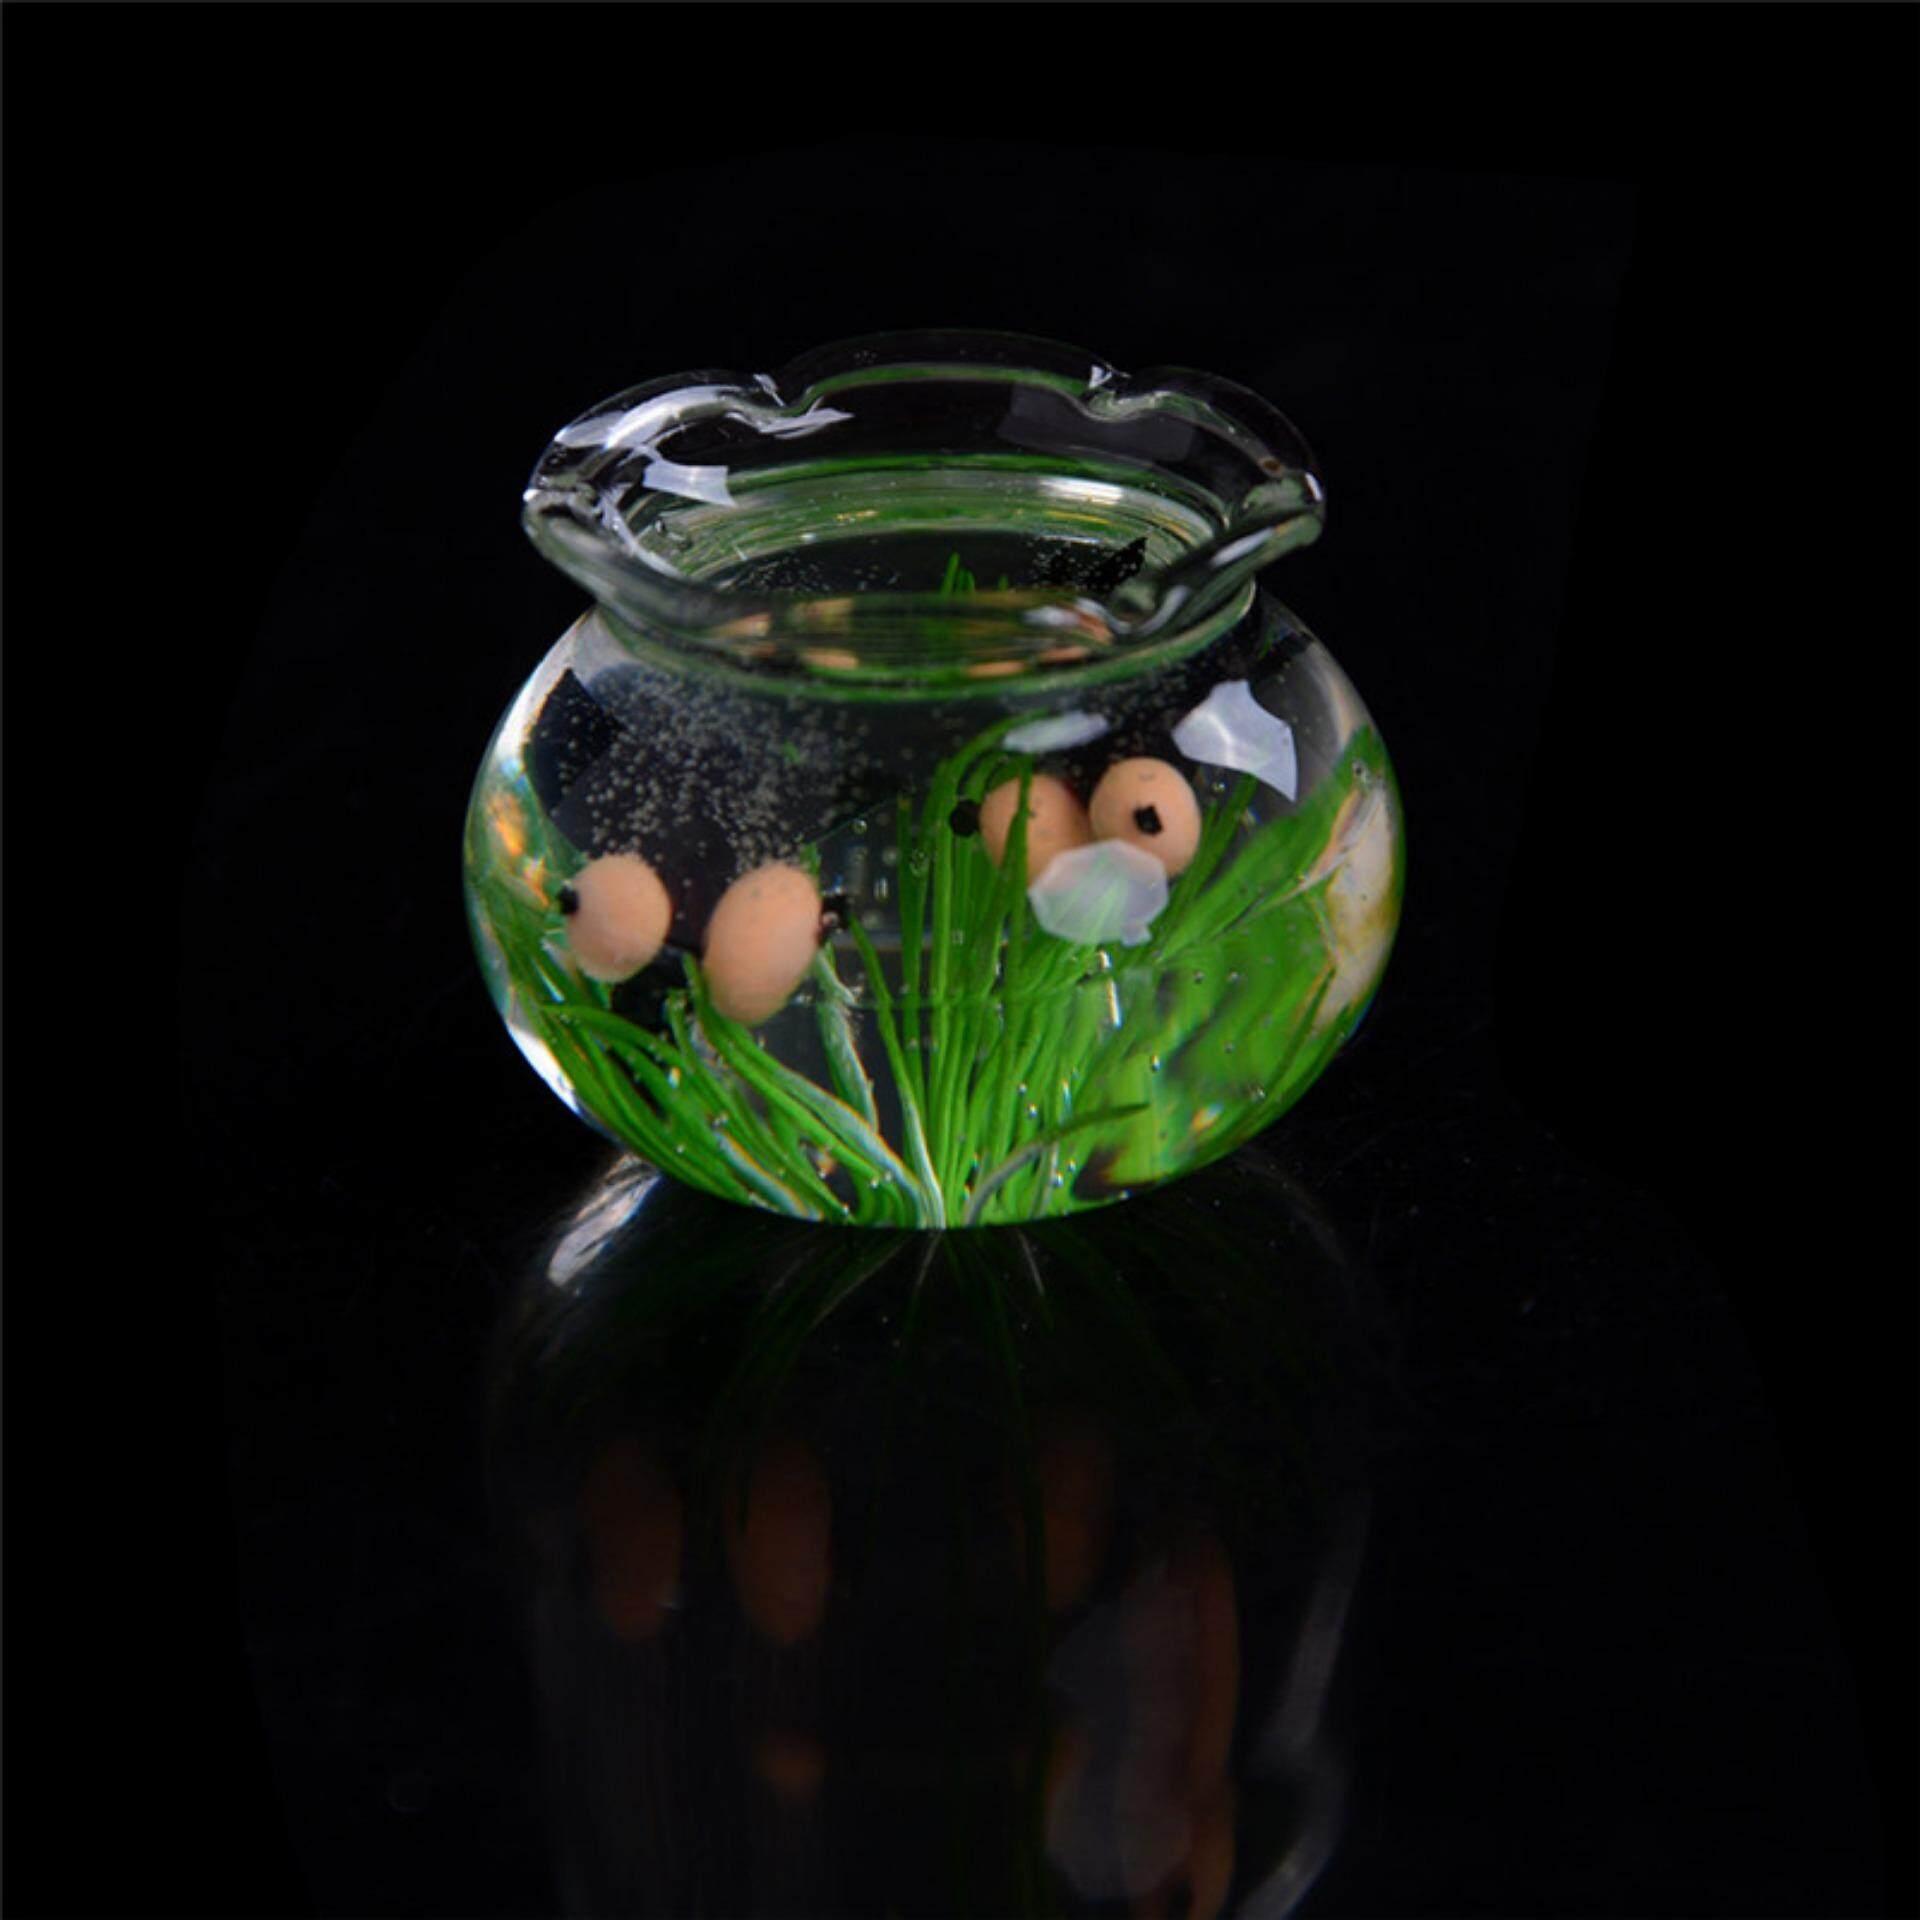 1:12 Miniatur Kaca Ikan Tangki Transparan Akuarium Rumah Boneka Ornamen Dekorasi Hitam-Internasional